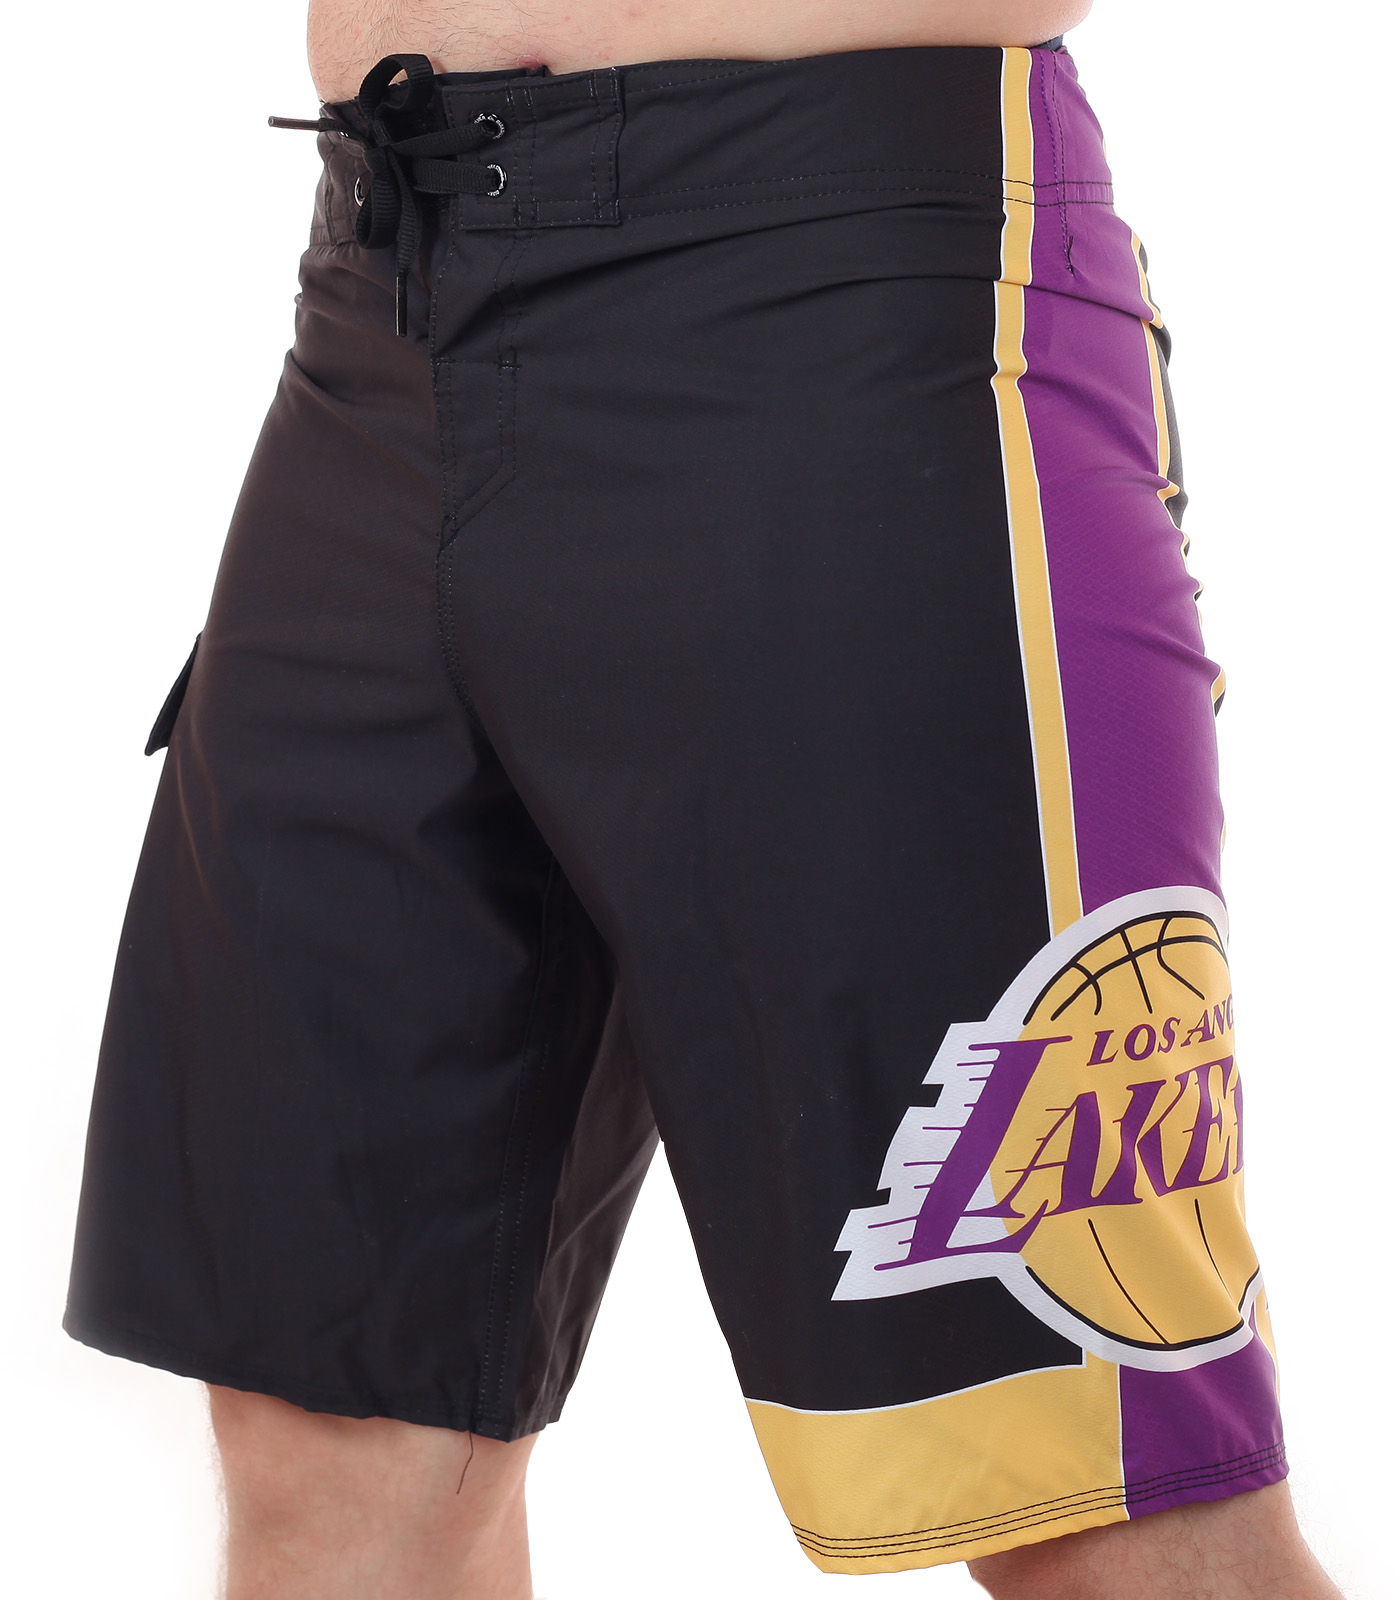 Топовые бордшорты Los Angeles Lakers